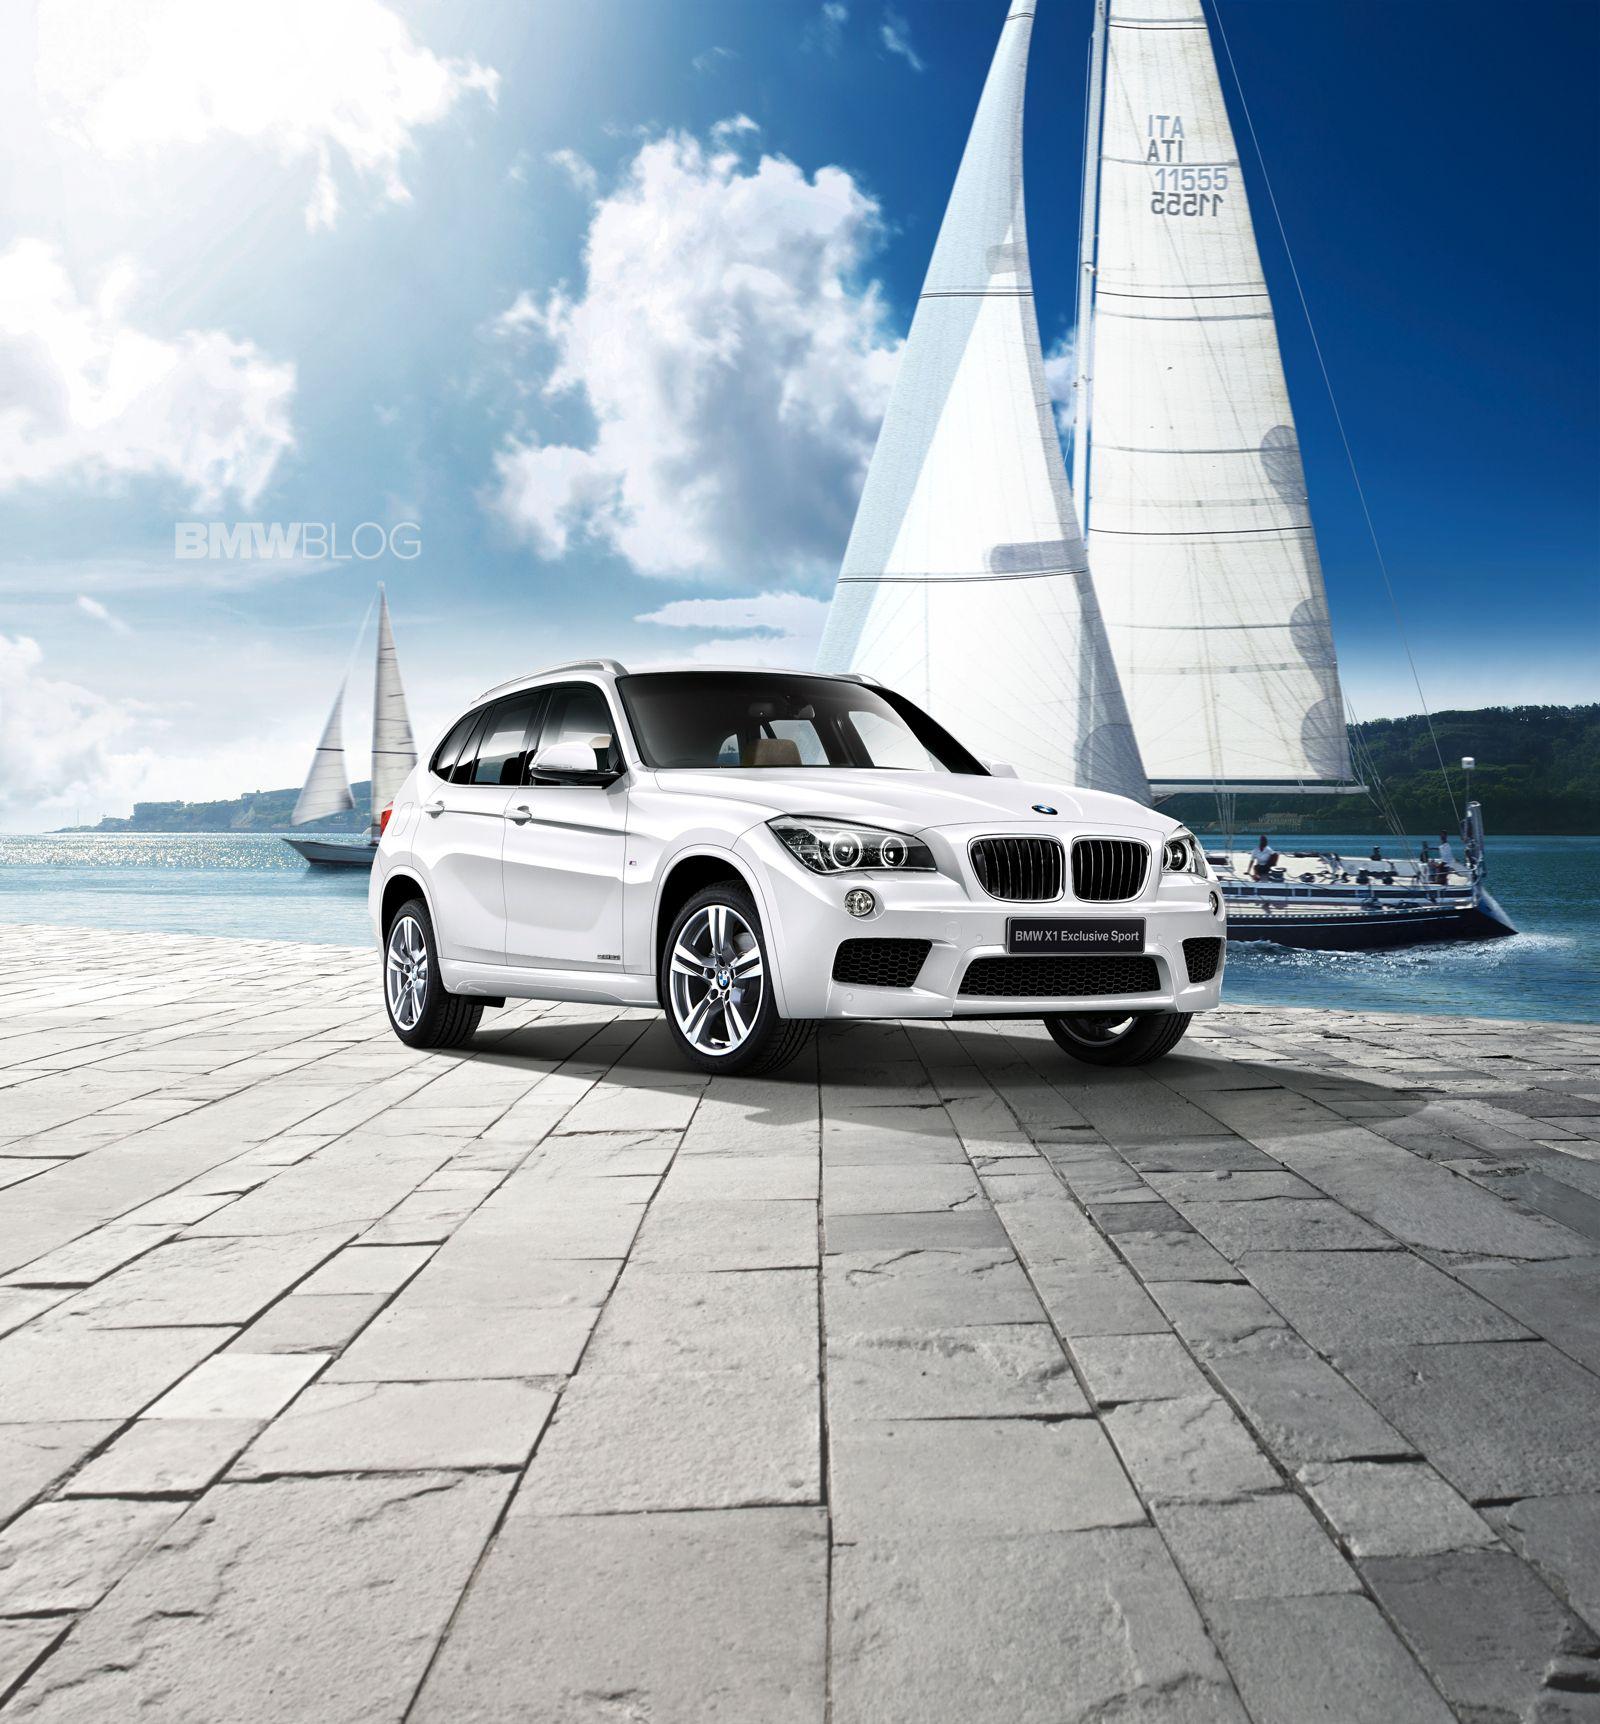 Bmw Xe: Pin By BMWBLOG.com On BMW